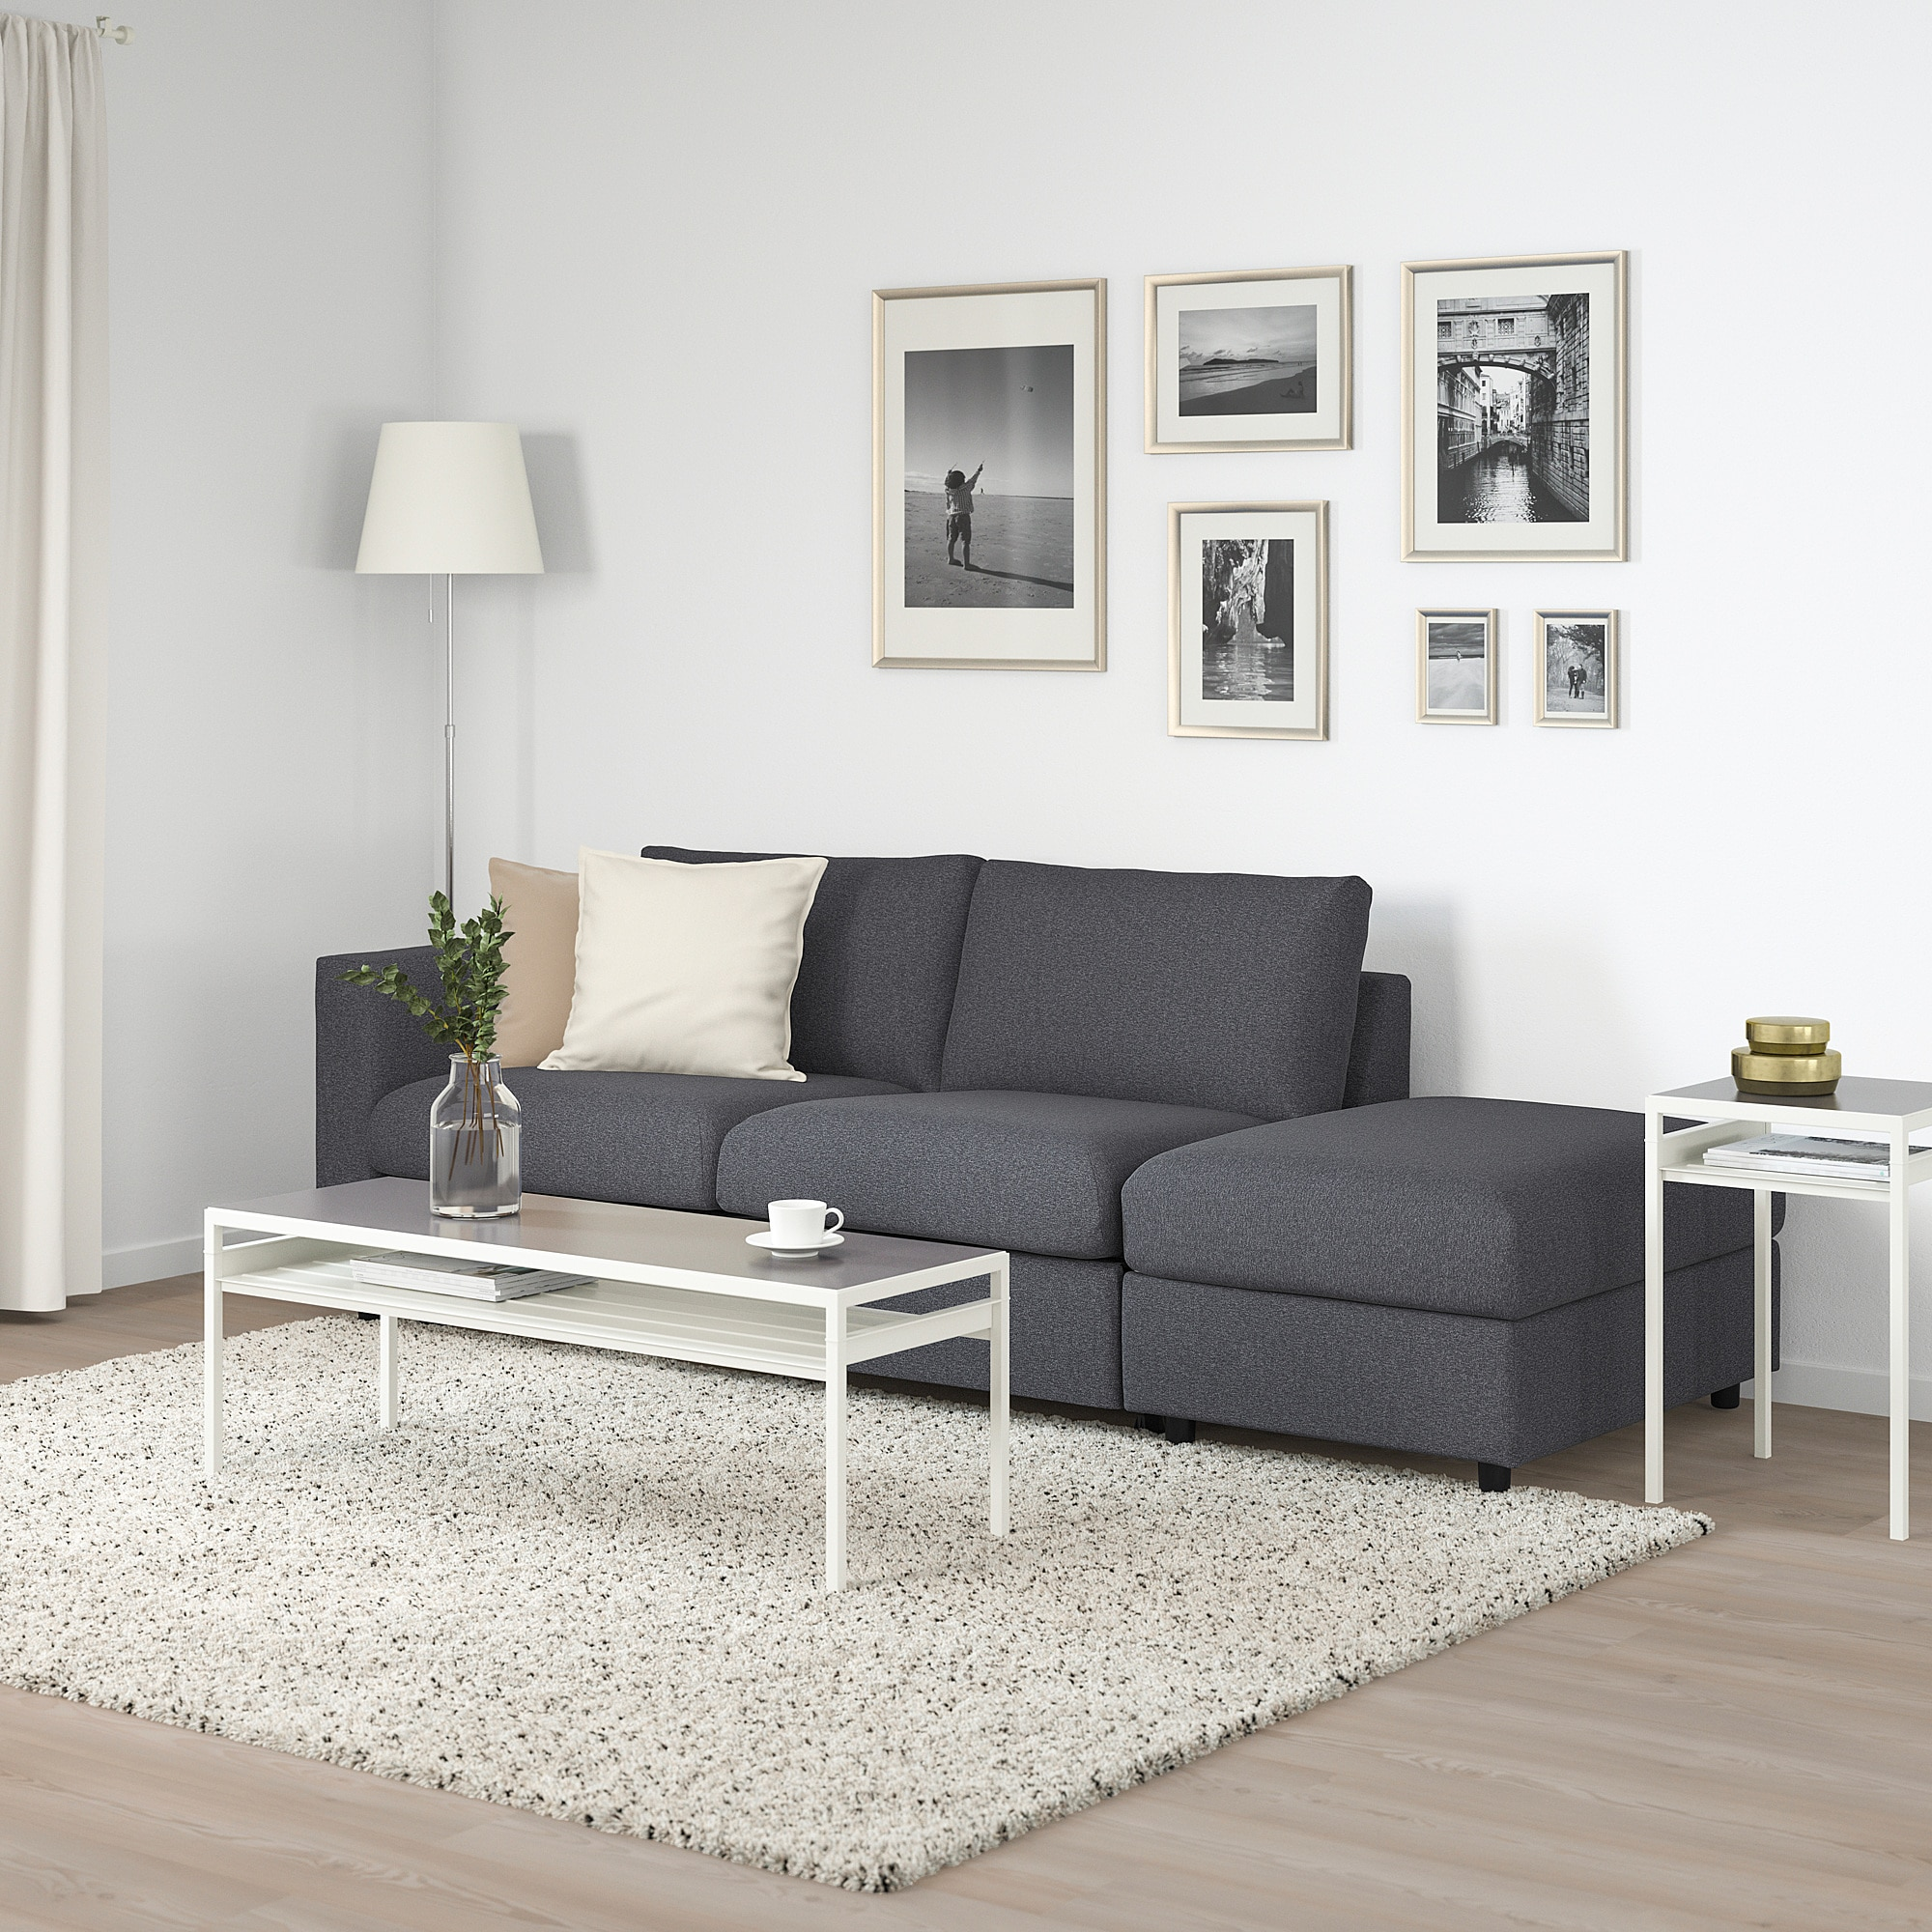 Ikea Vimle Sofabed With Chaise Open End Gunnared Medium Gray Canape Lit Deco Maison Matelas En Mousse